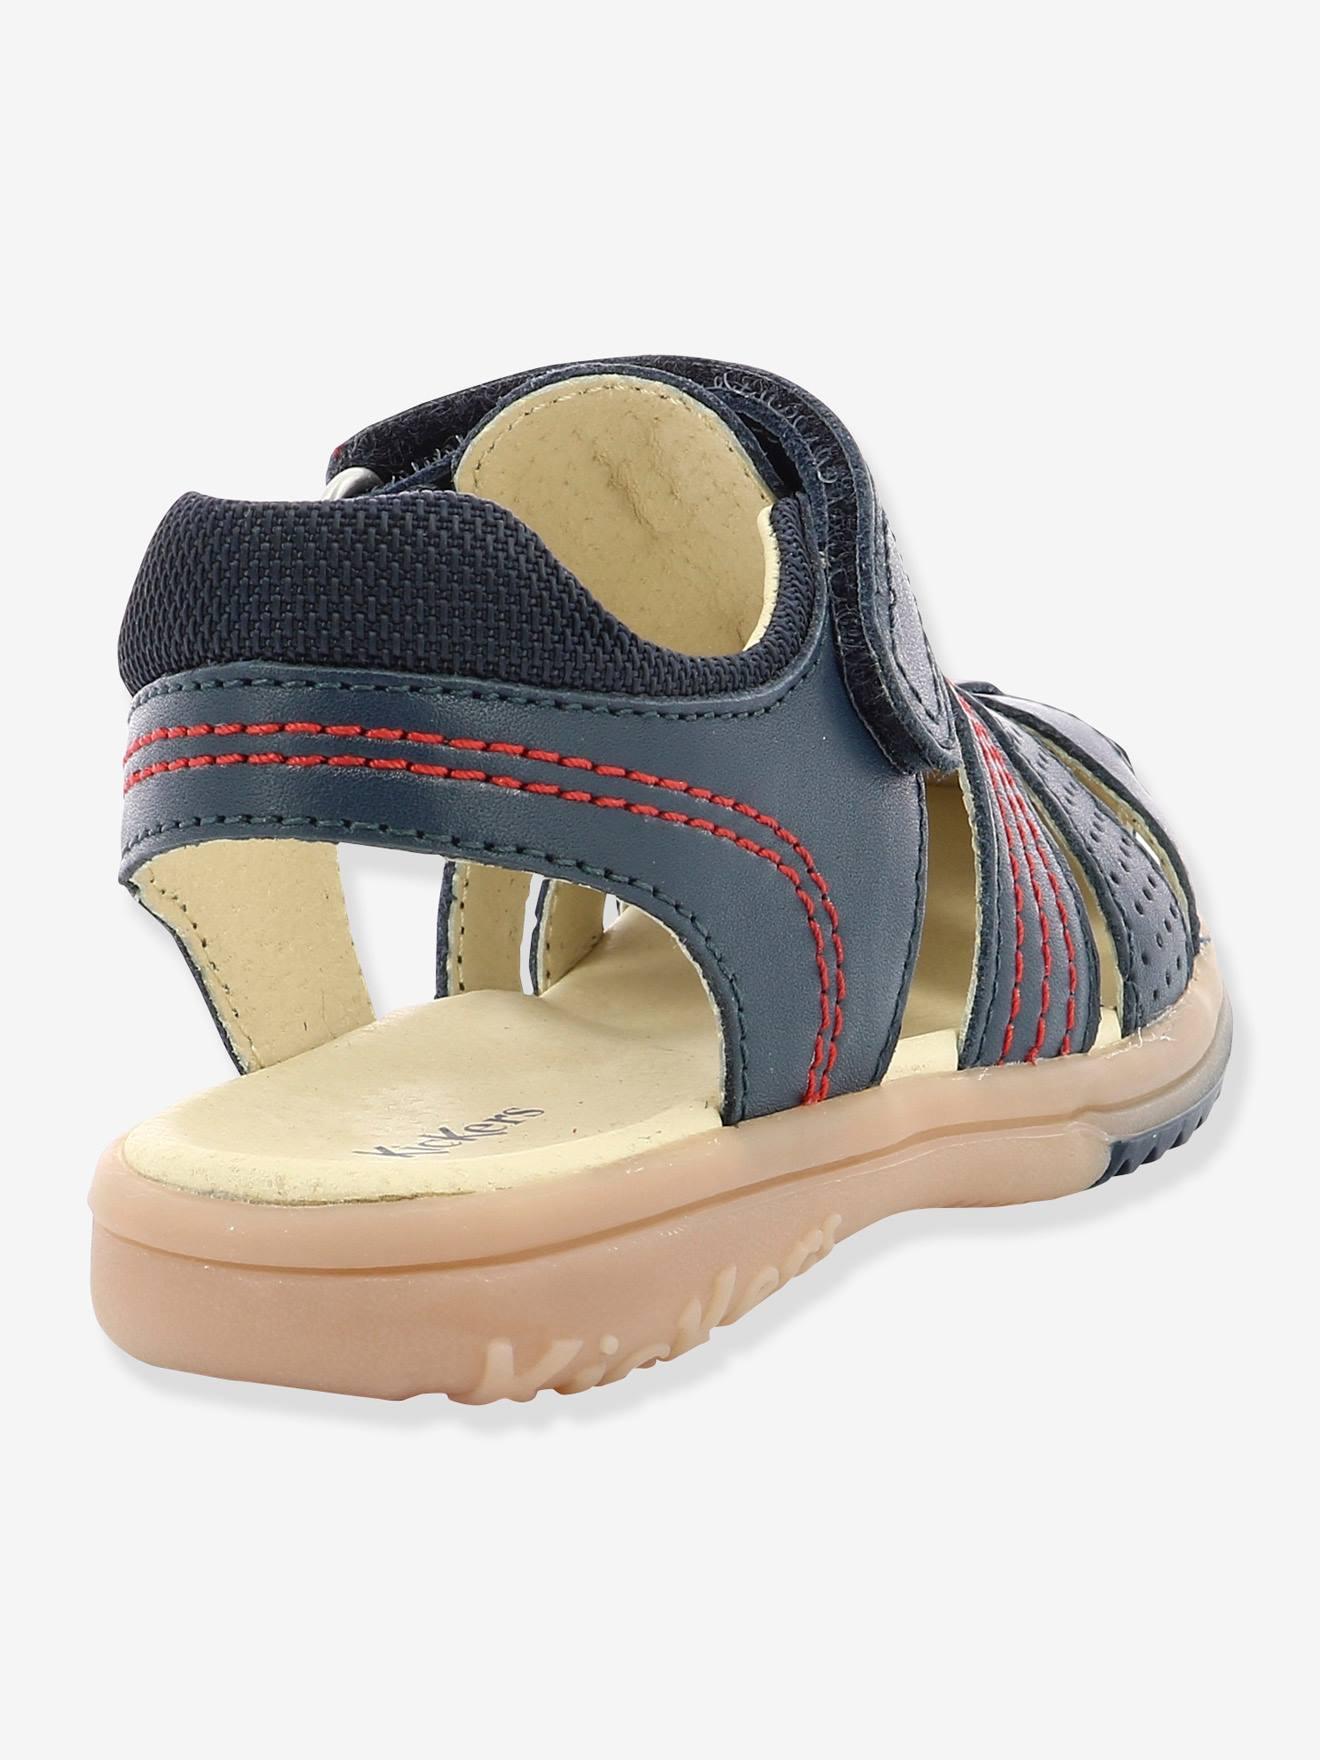 d87cfe37ff503 Garçon En Platinium Sandales Cuir Kickers®Chaussures Y6g7bfy